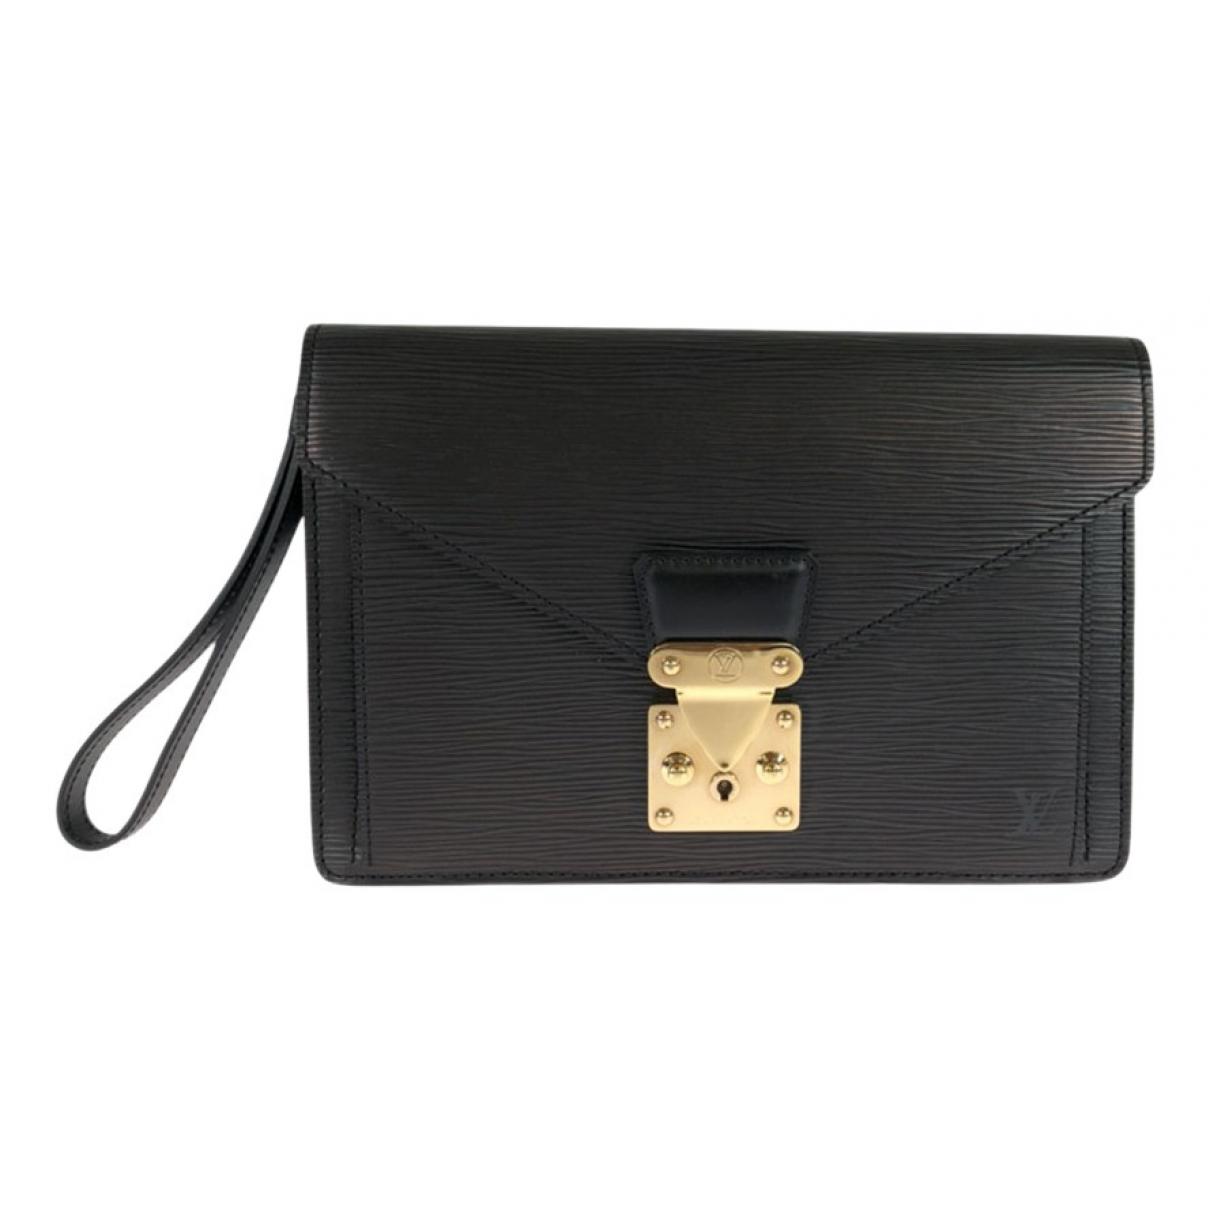 Louis Vuitton N Black Leather bag for Men N